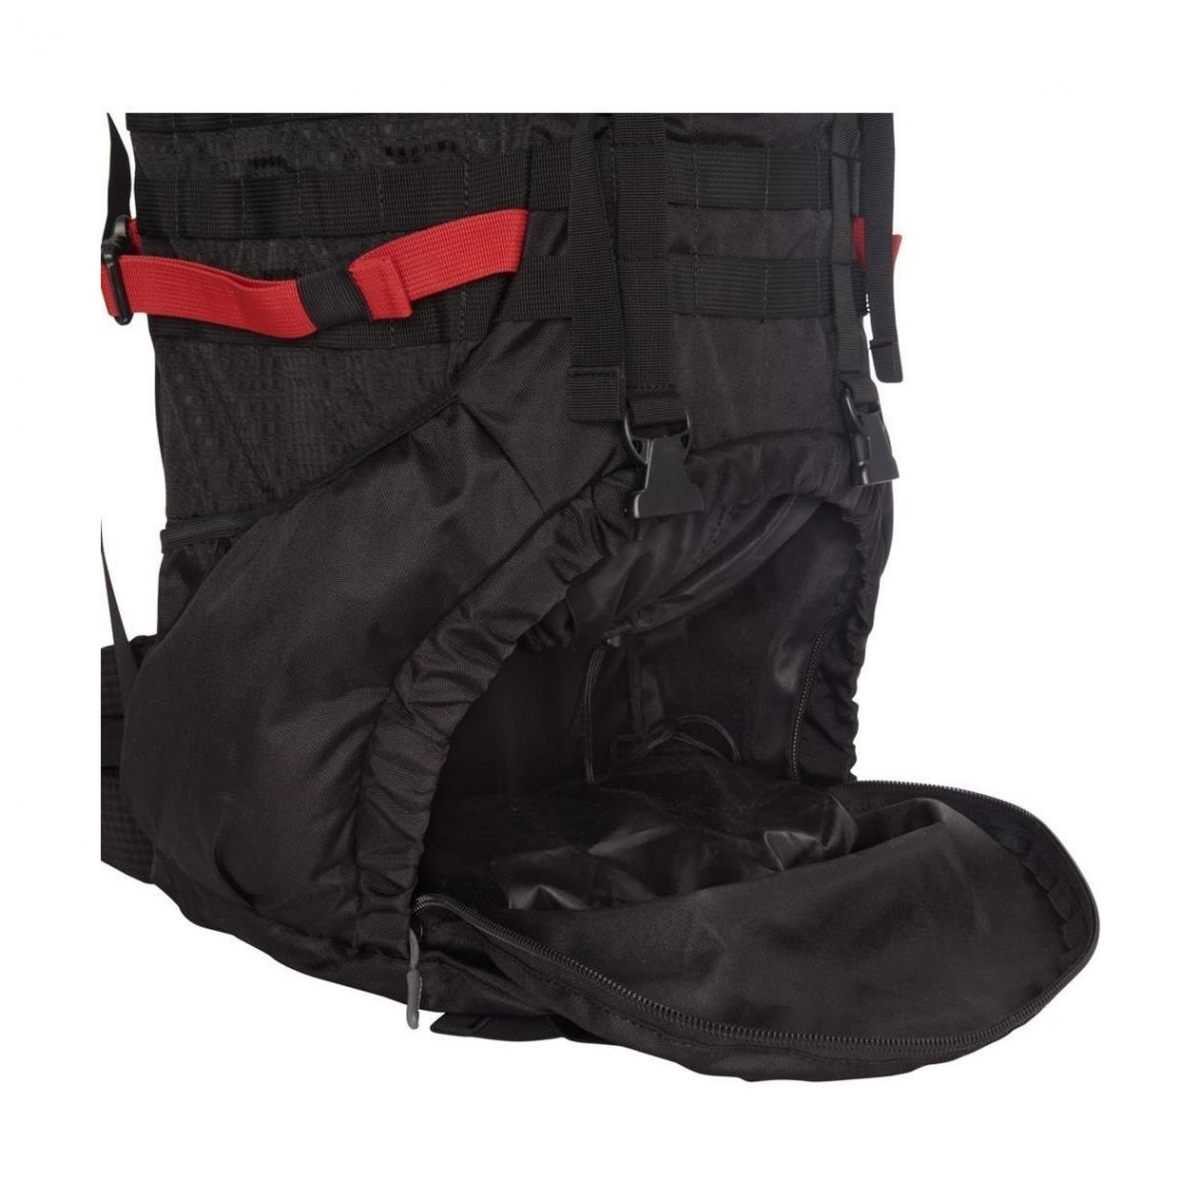 Caribee pulse рюкзак wenger рюкзаки где купить в москве